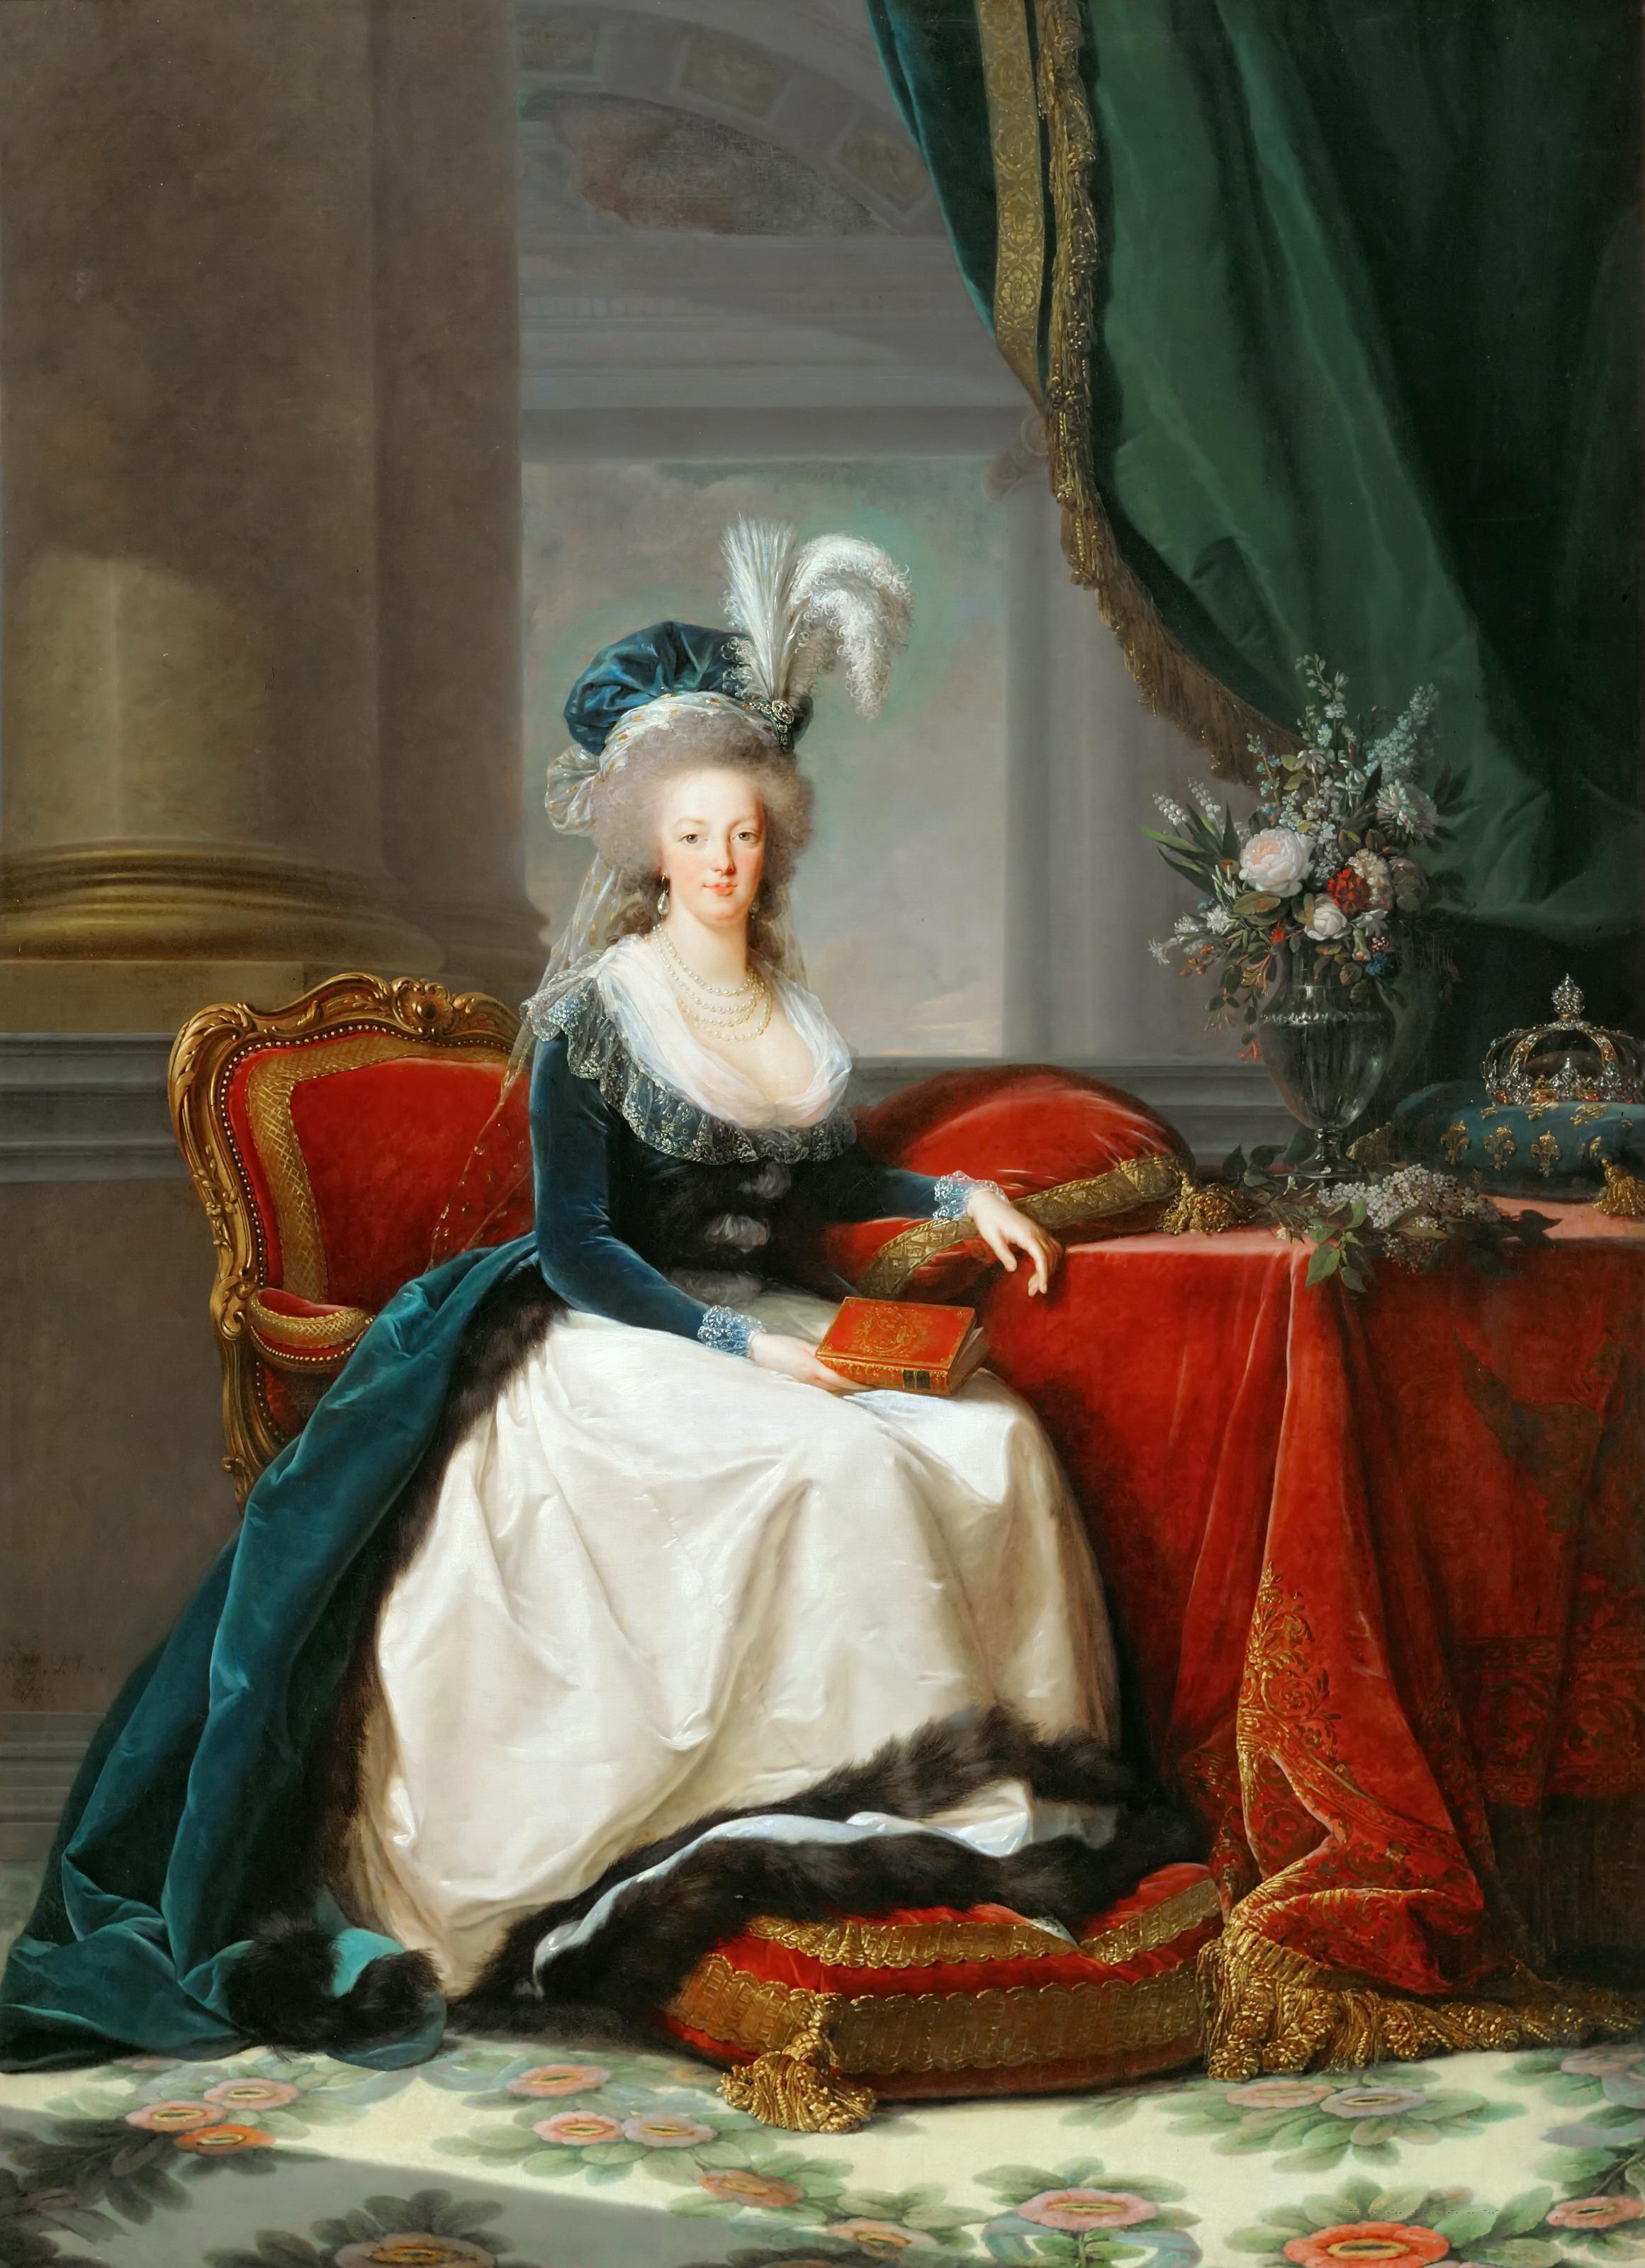 Fichier:MarieAntoinette1788.jpg — Wikipédia